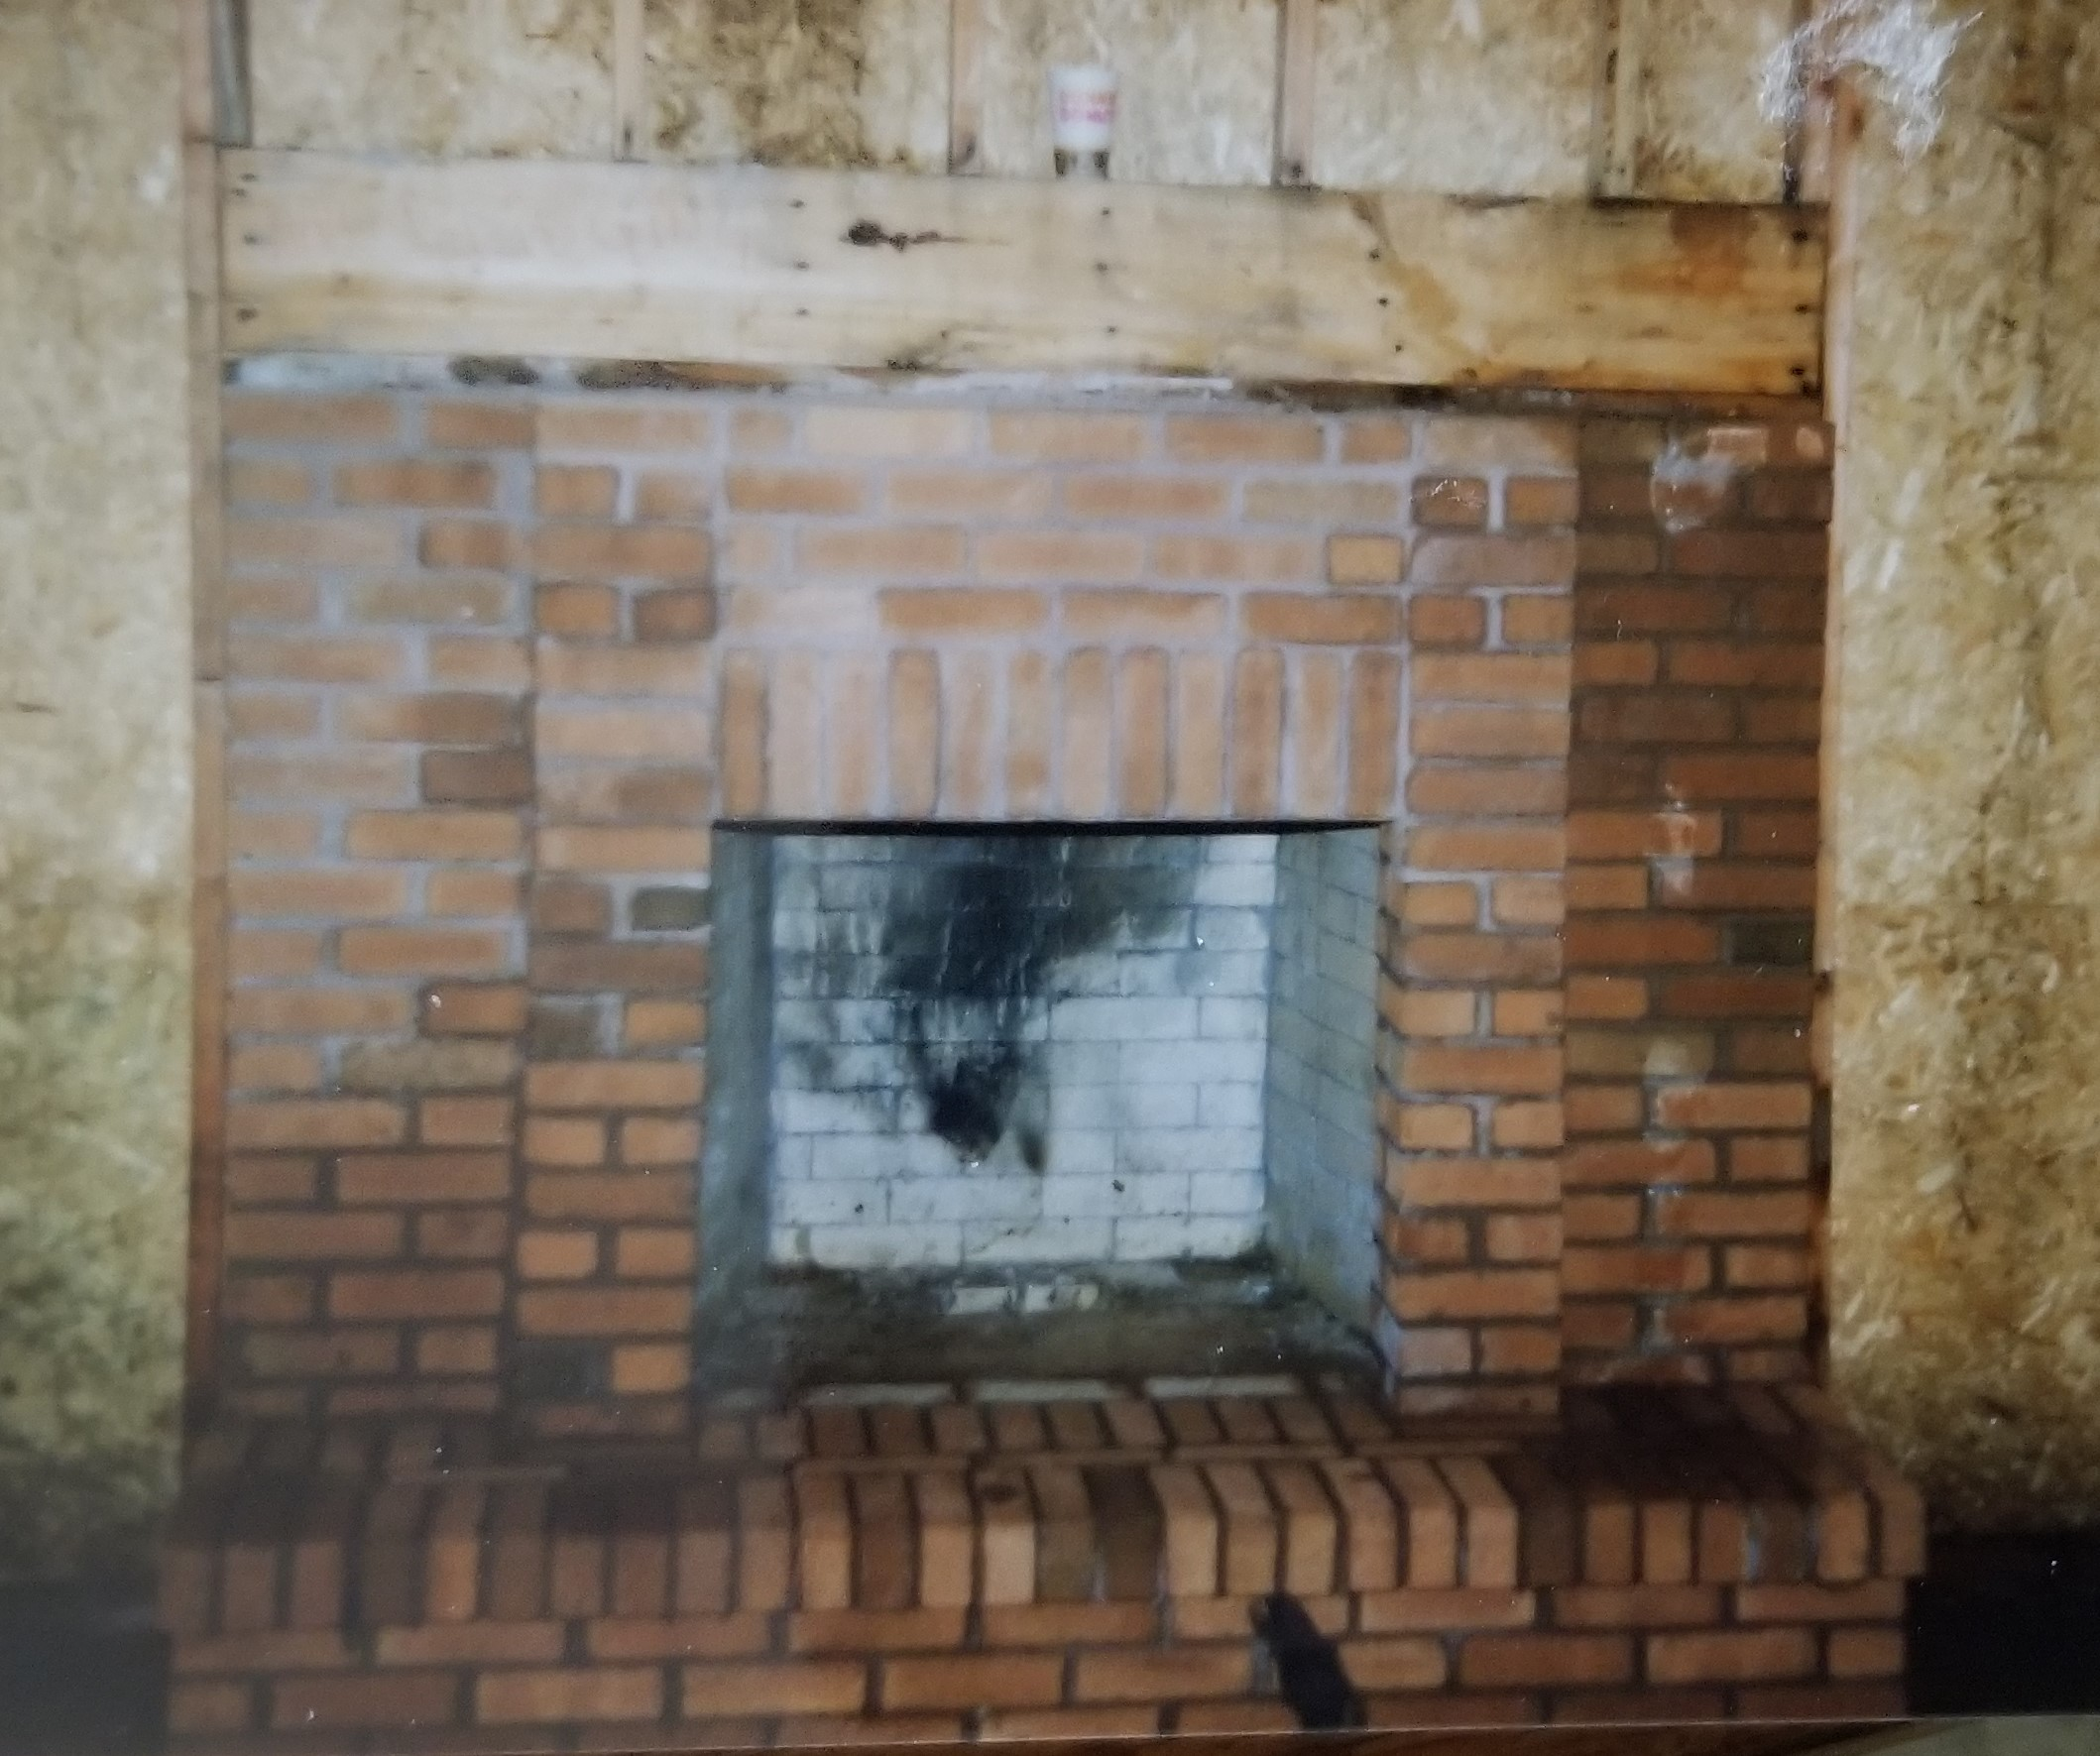 Removing fireplace brick-2019-02-11-09.37.25.jpg